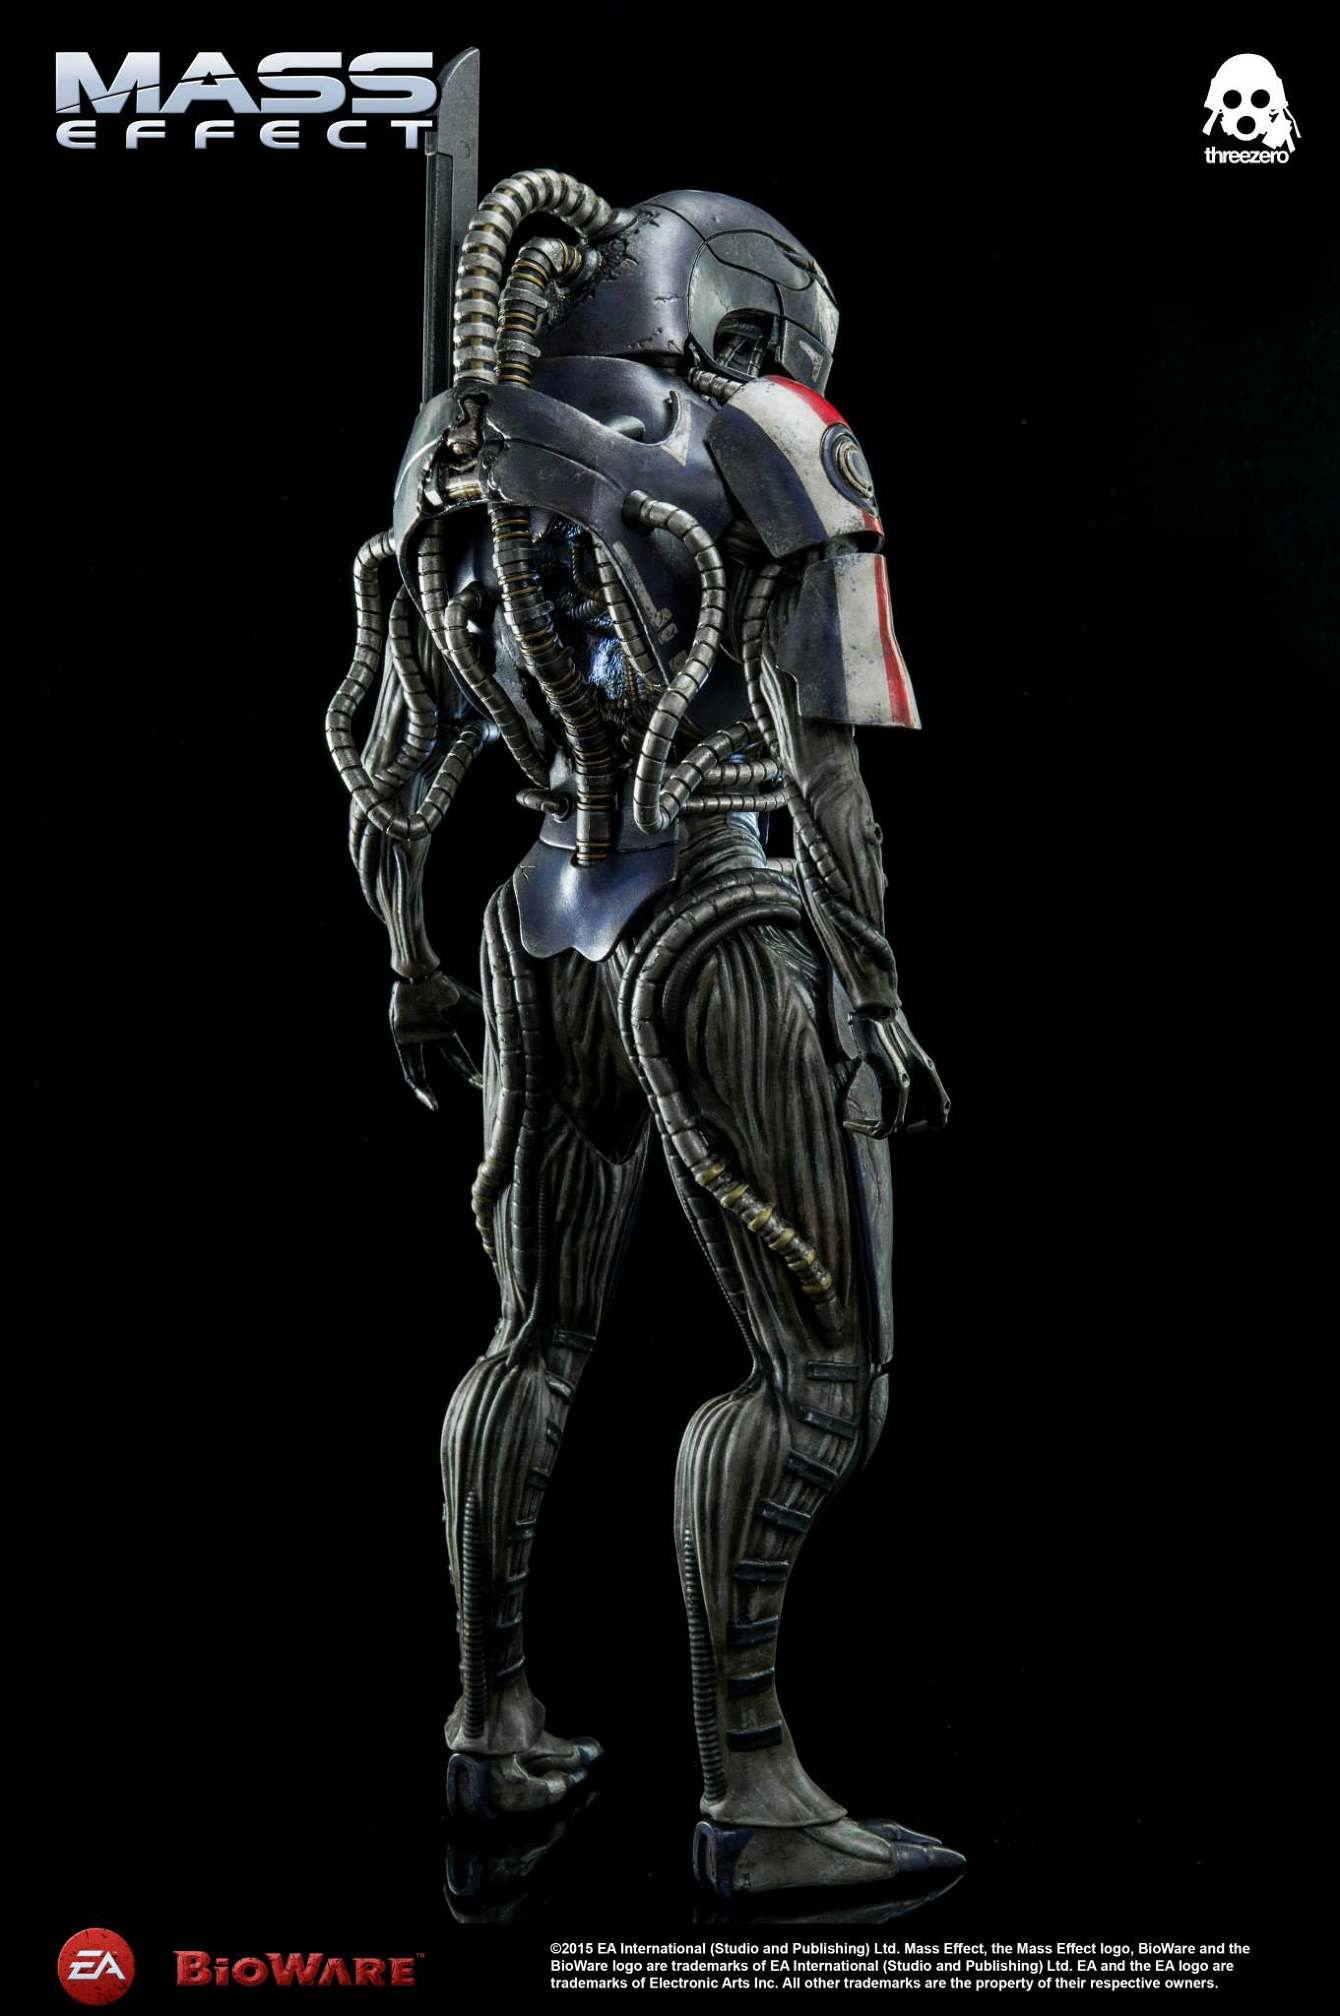 ThreeZero-Bioware-video-game-Legion-Mass-Effect-figure-14_1340_c.jpg